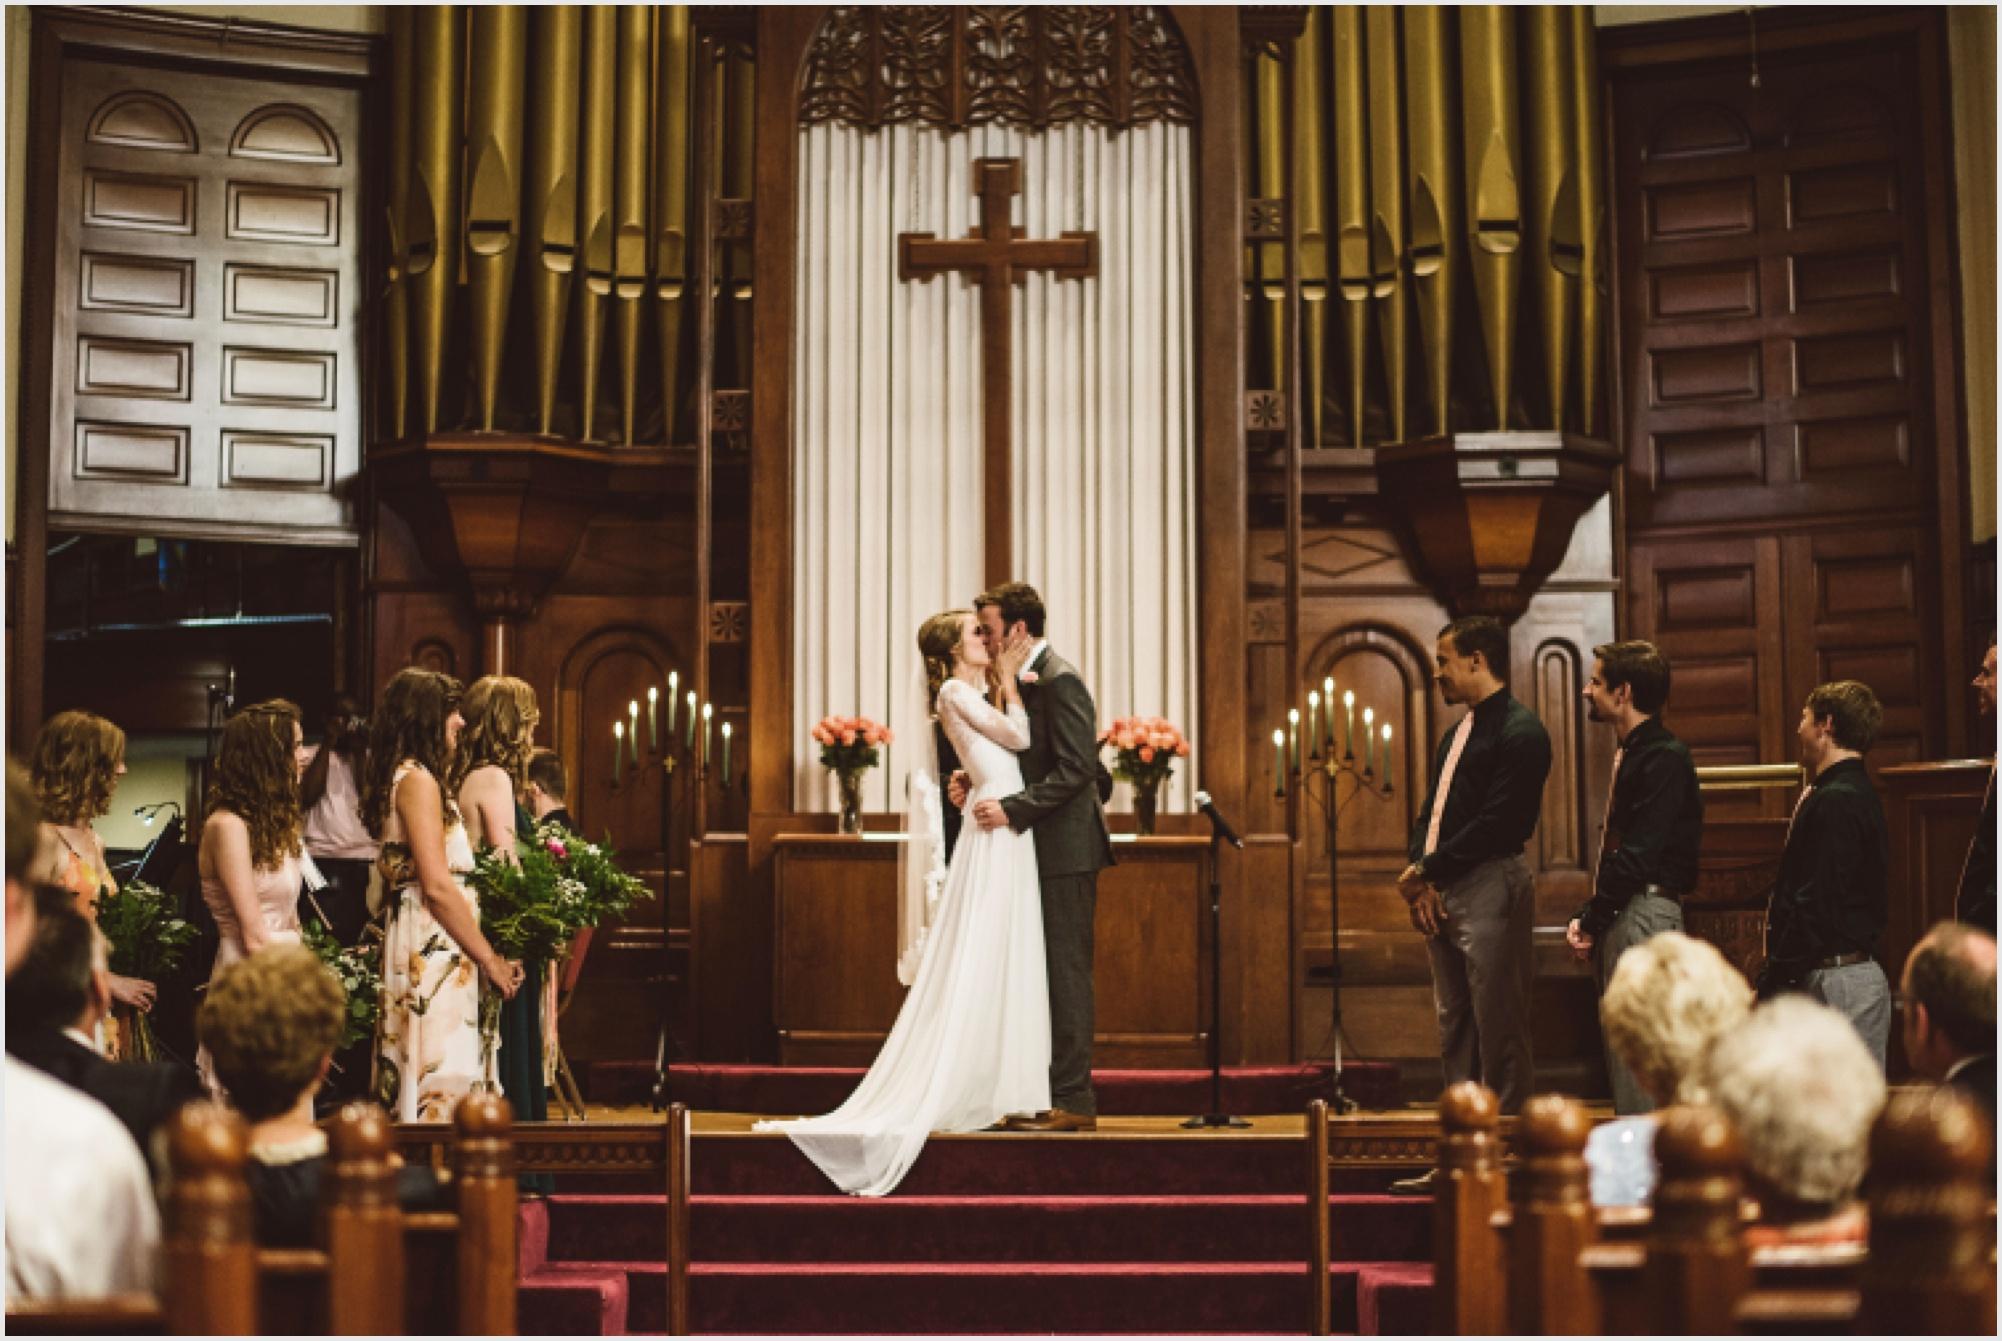 abby_taylor_minneapolis_wedding_lucas_botz_photography_154.jpg